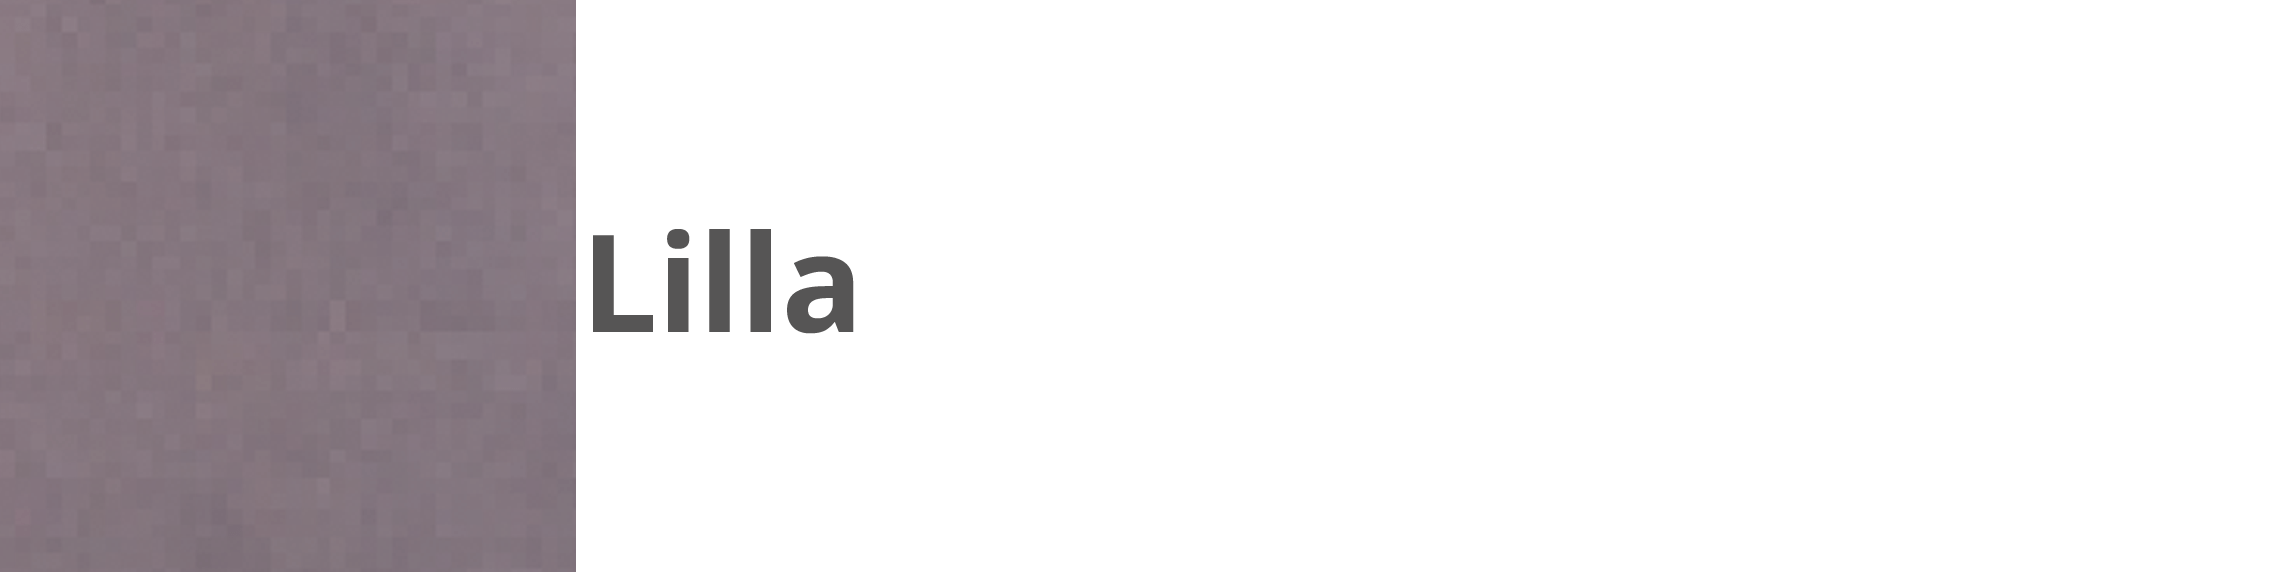 6N35 Microfibra Lilla